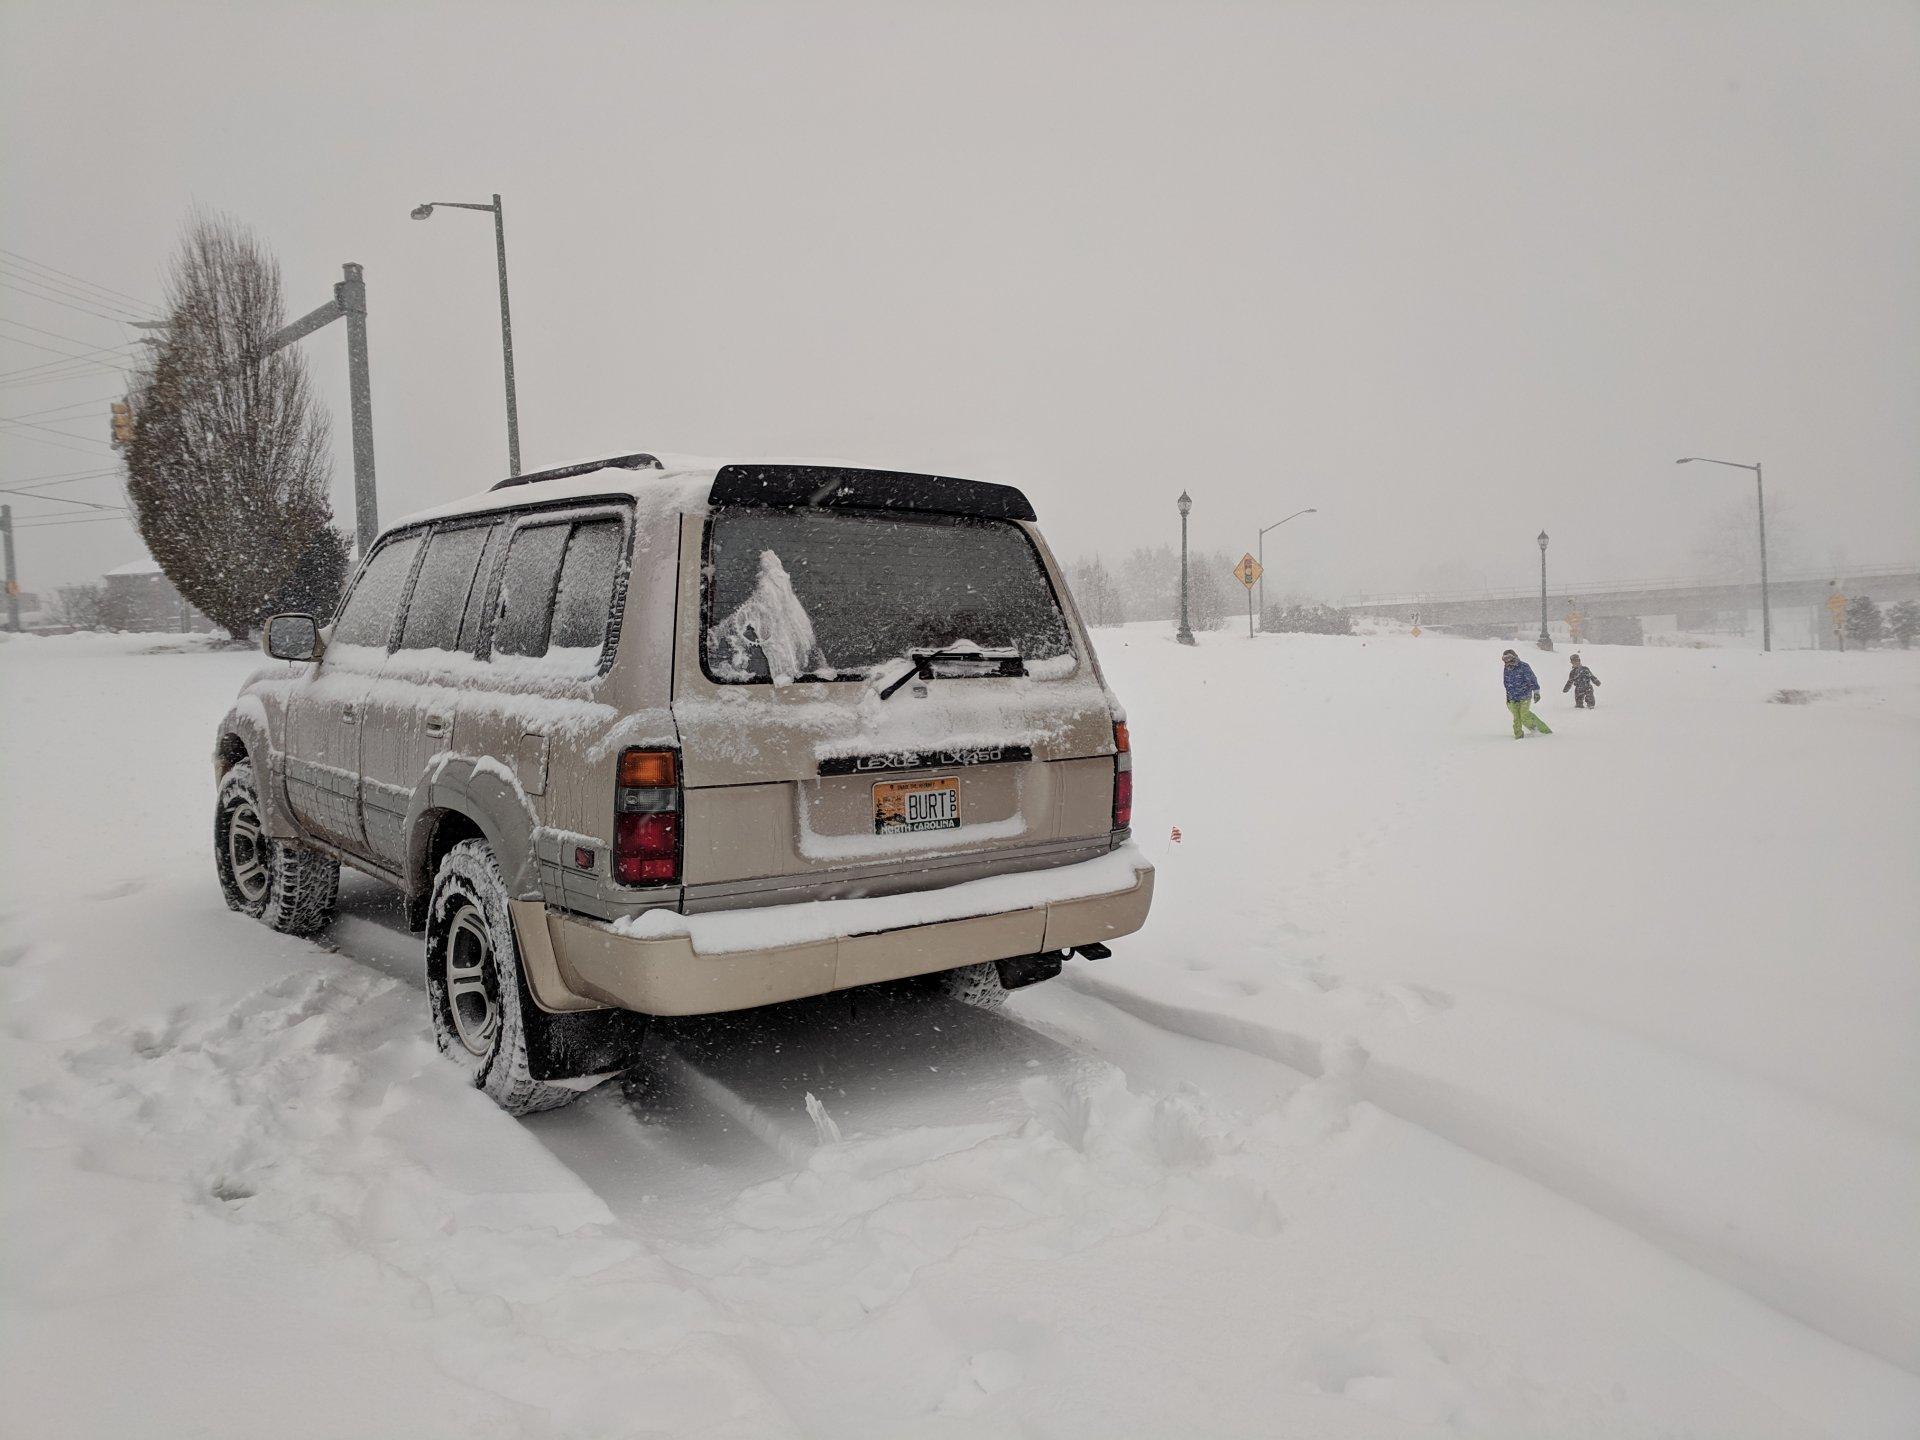 burt in snow.jpg